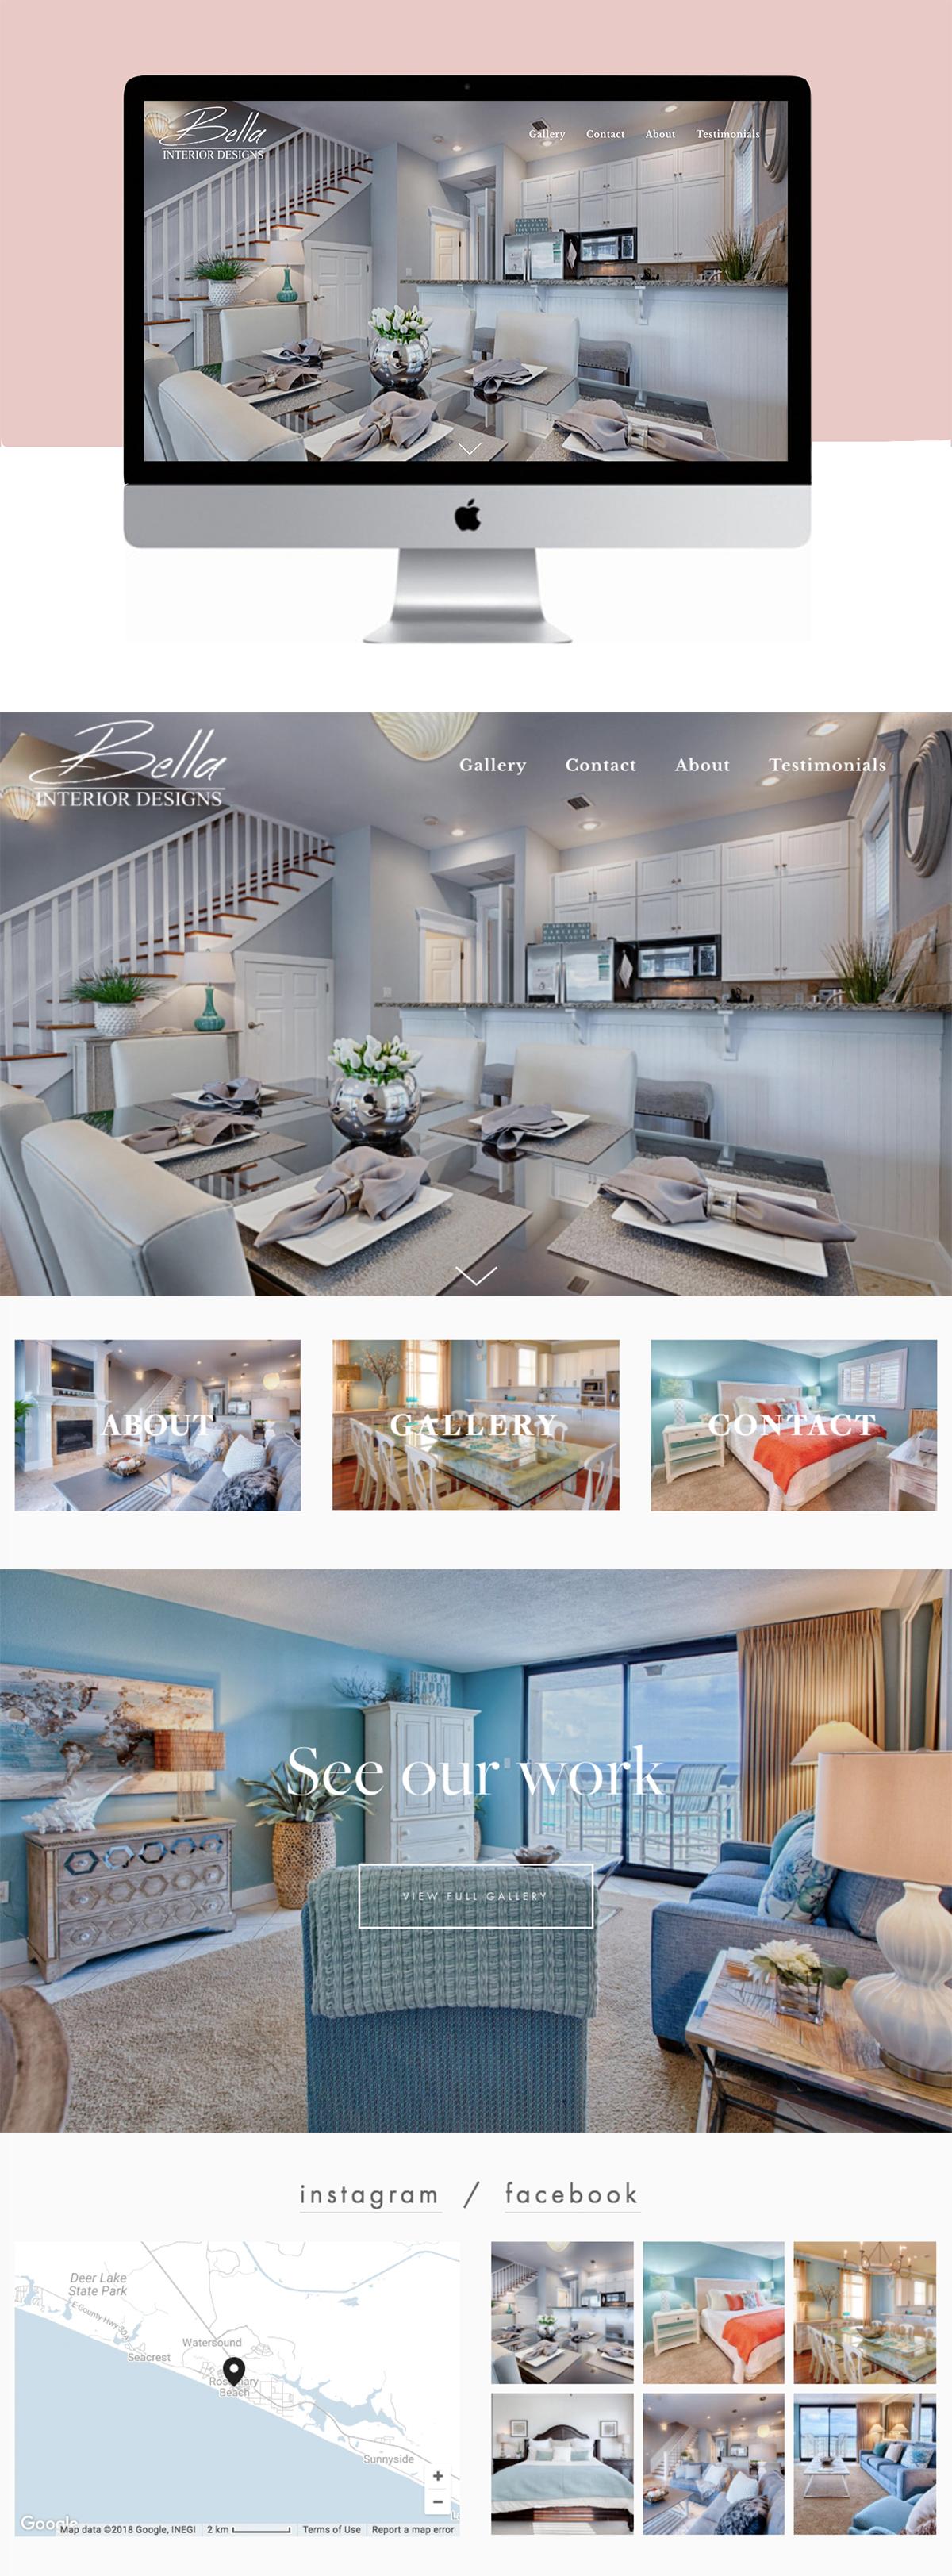 Bella Interior Design.jpg